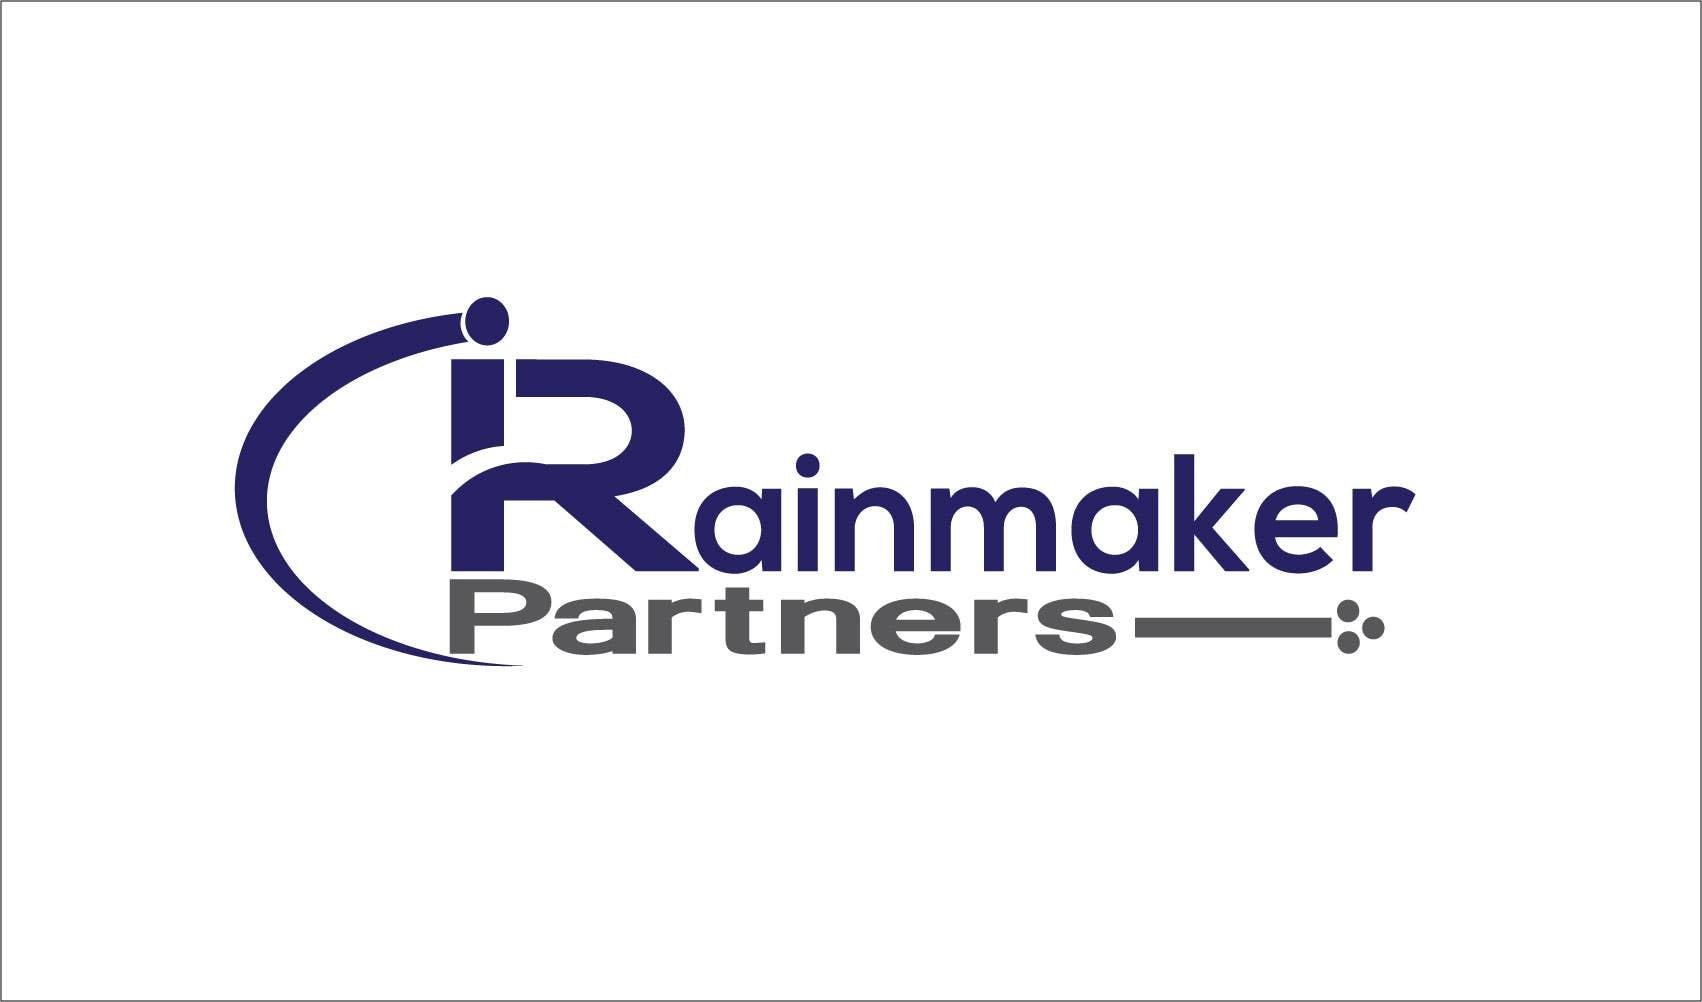 logo creater